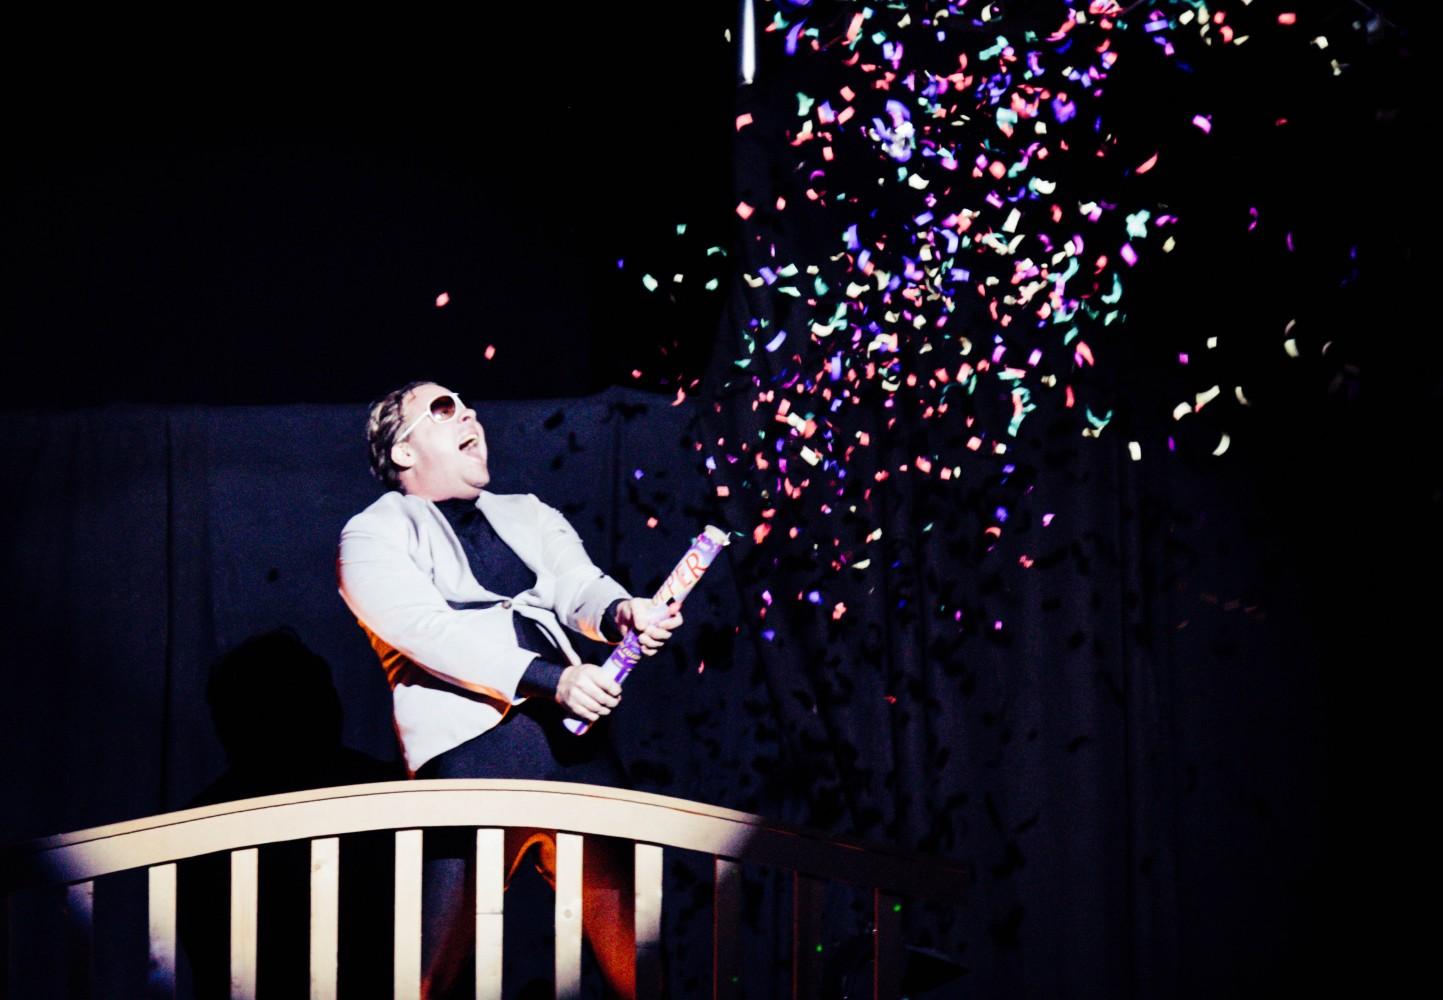 En person på scenen som skyter opp konfetti. Foto.